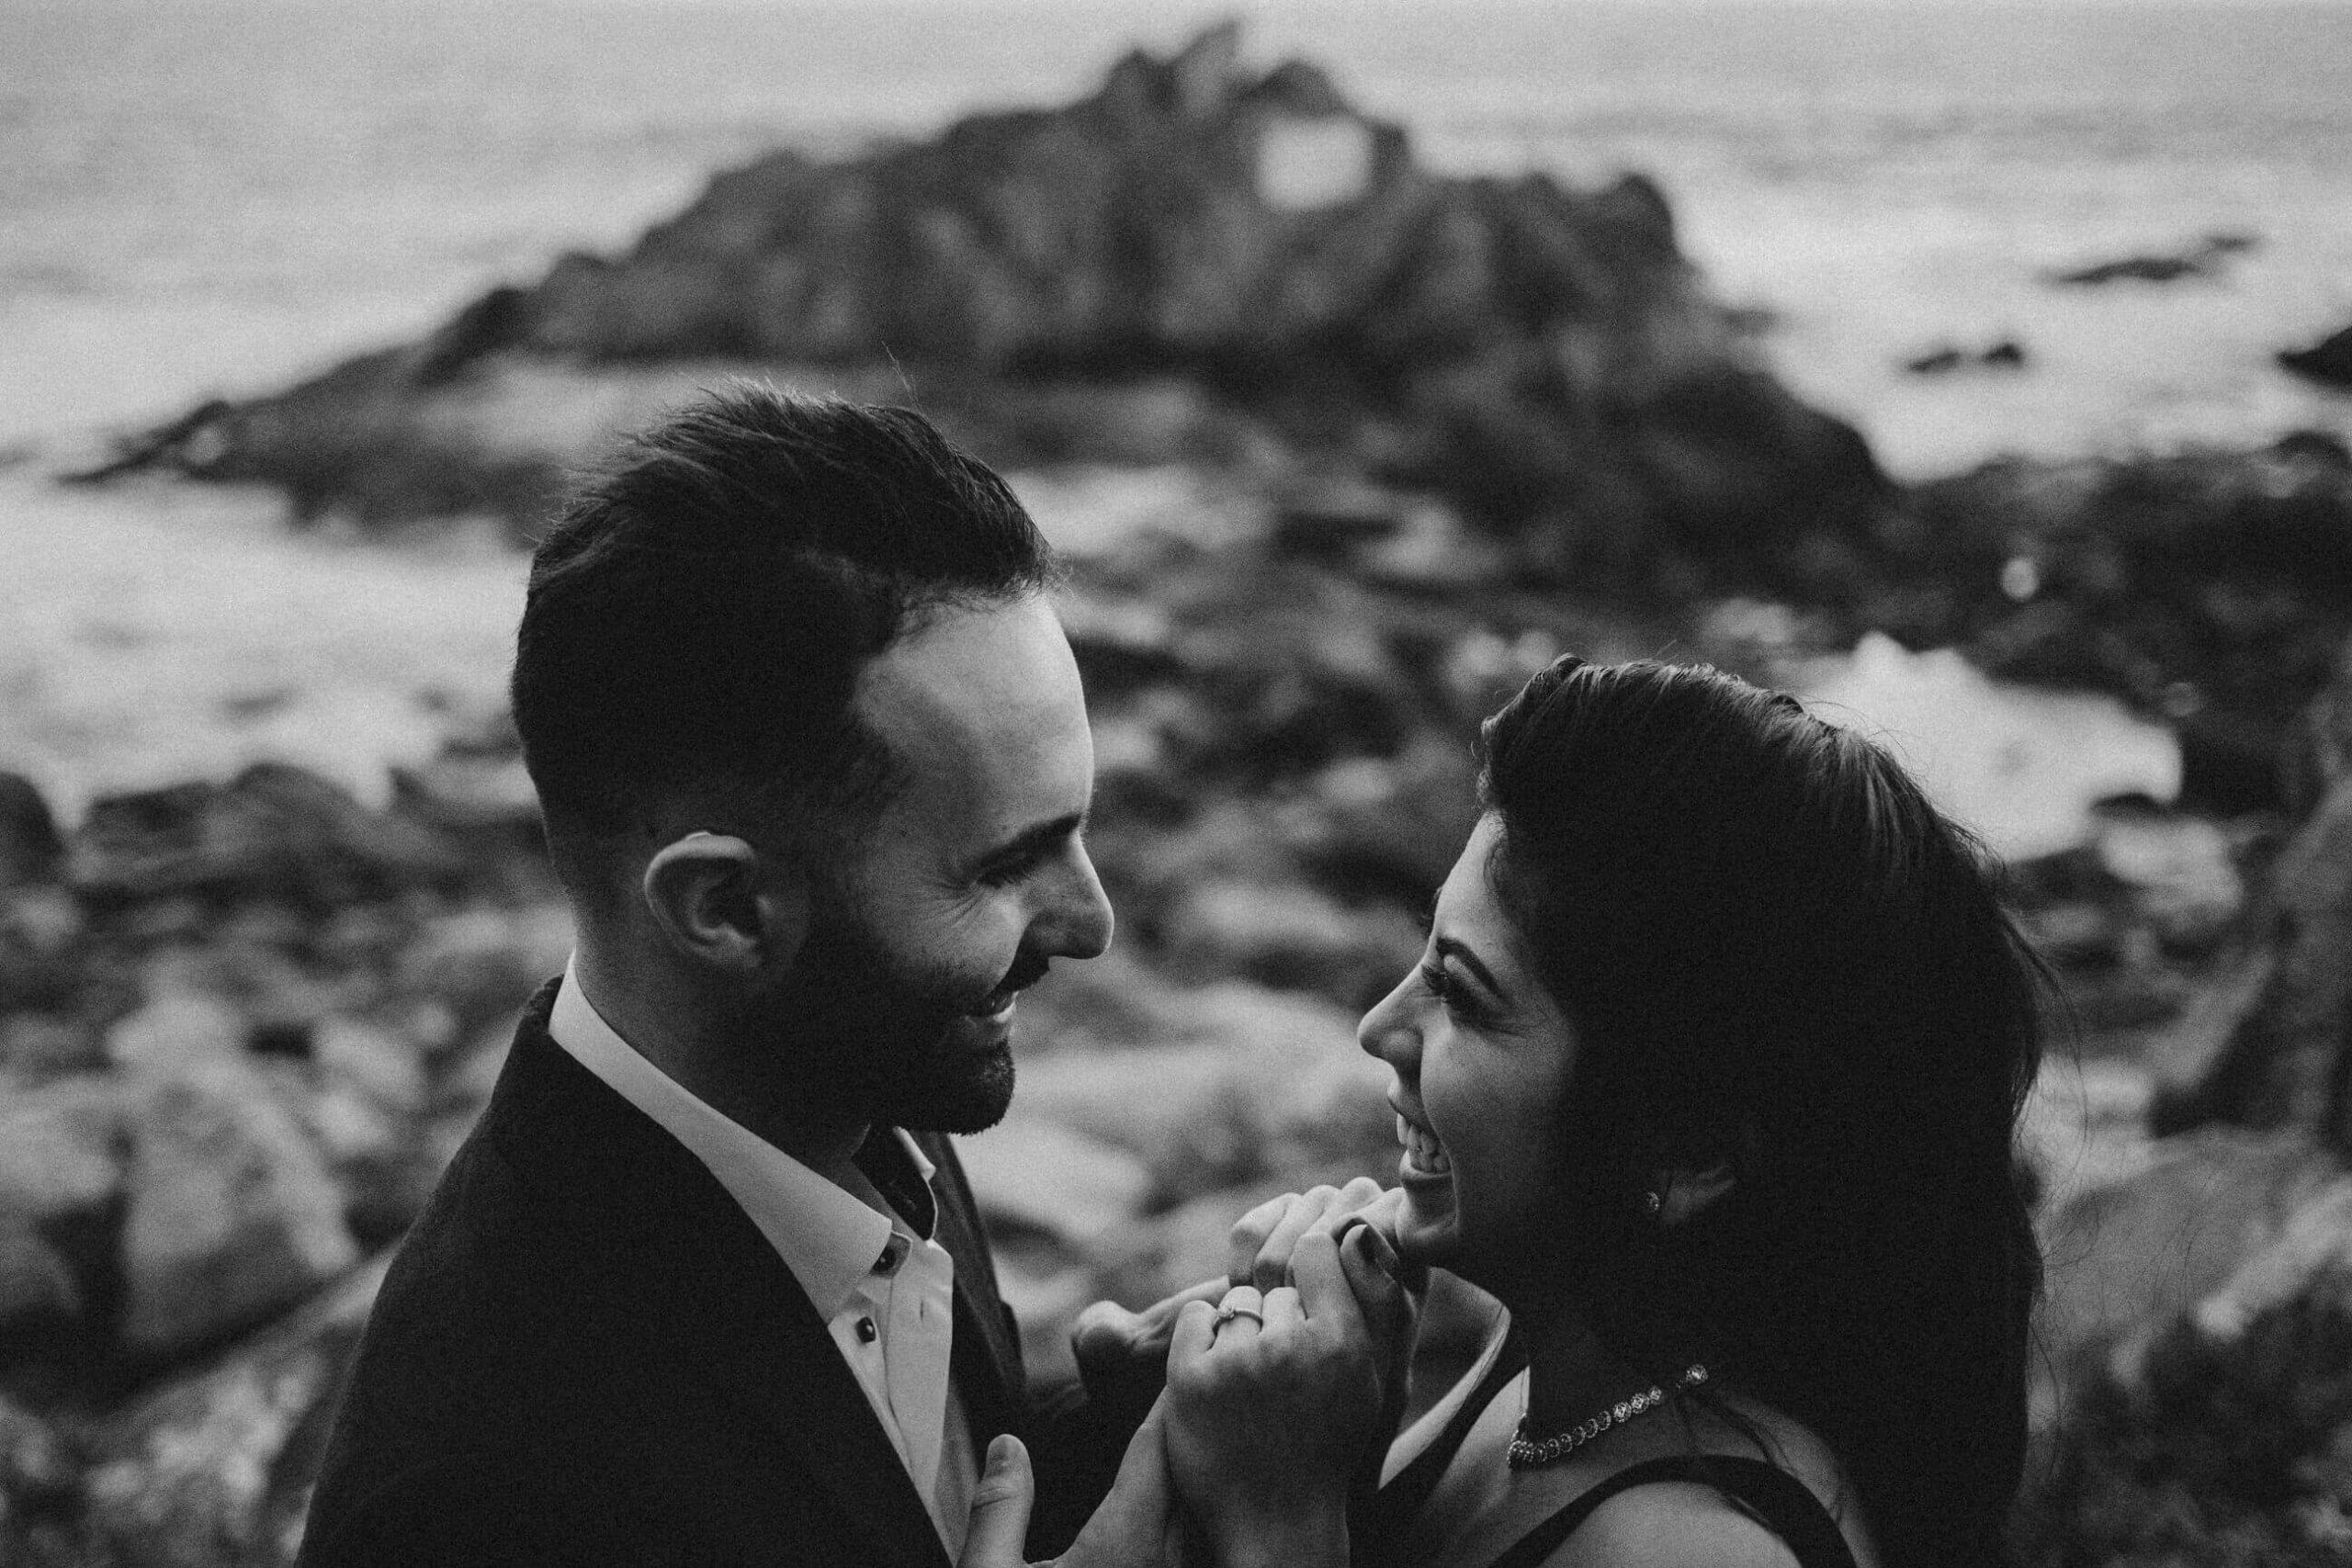 roma-organizacao-eventos-pedido-casamento-casa-de-cha-da-boa-nova-porto-portugal-20